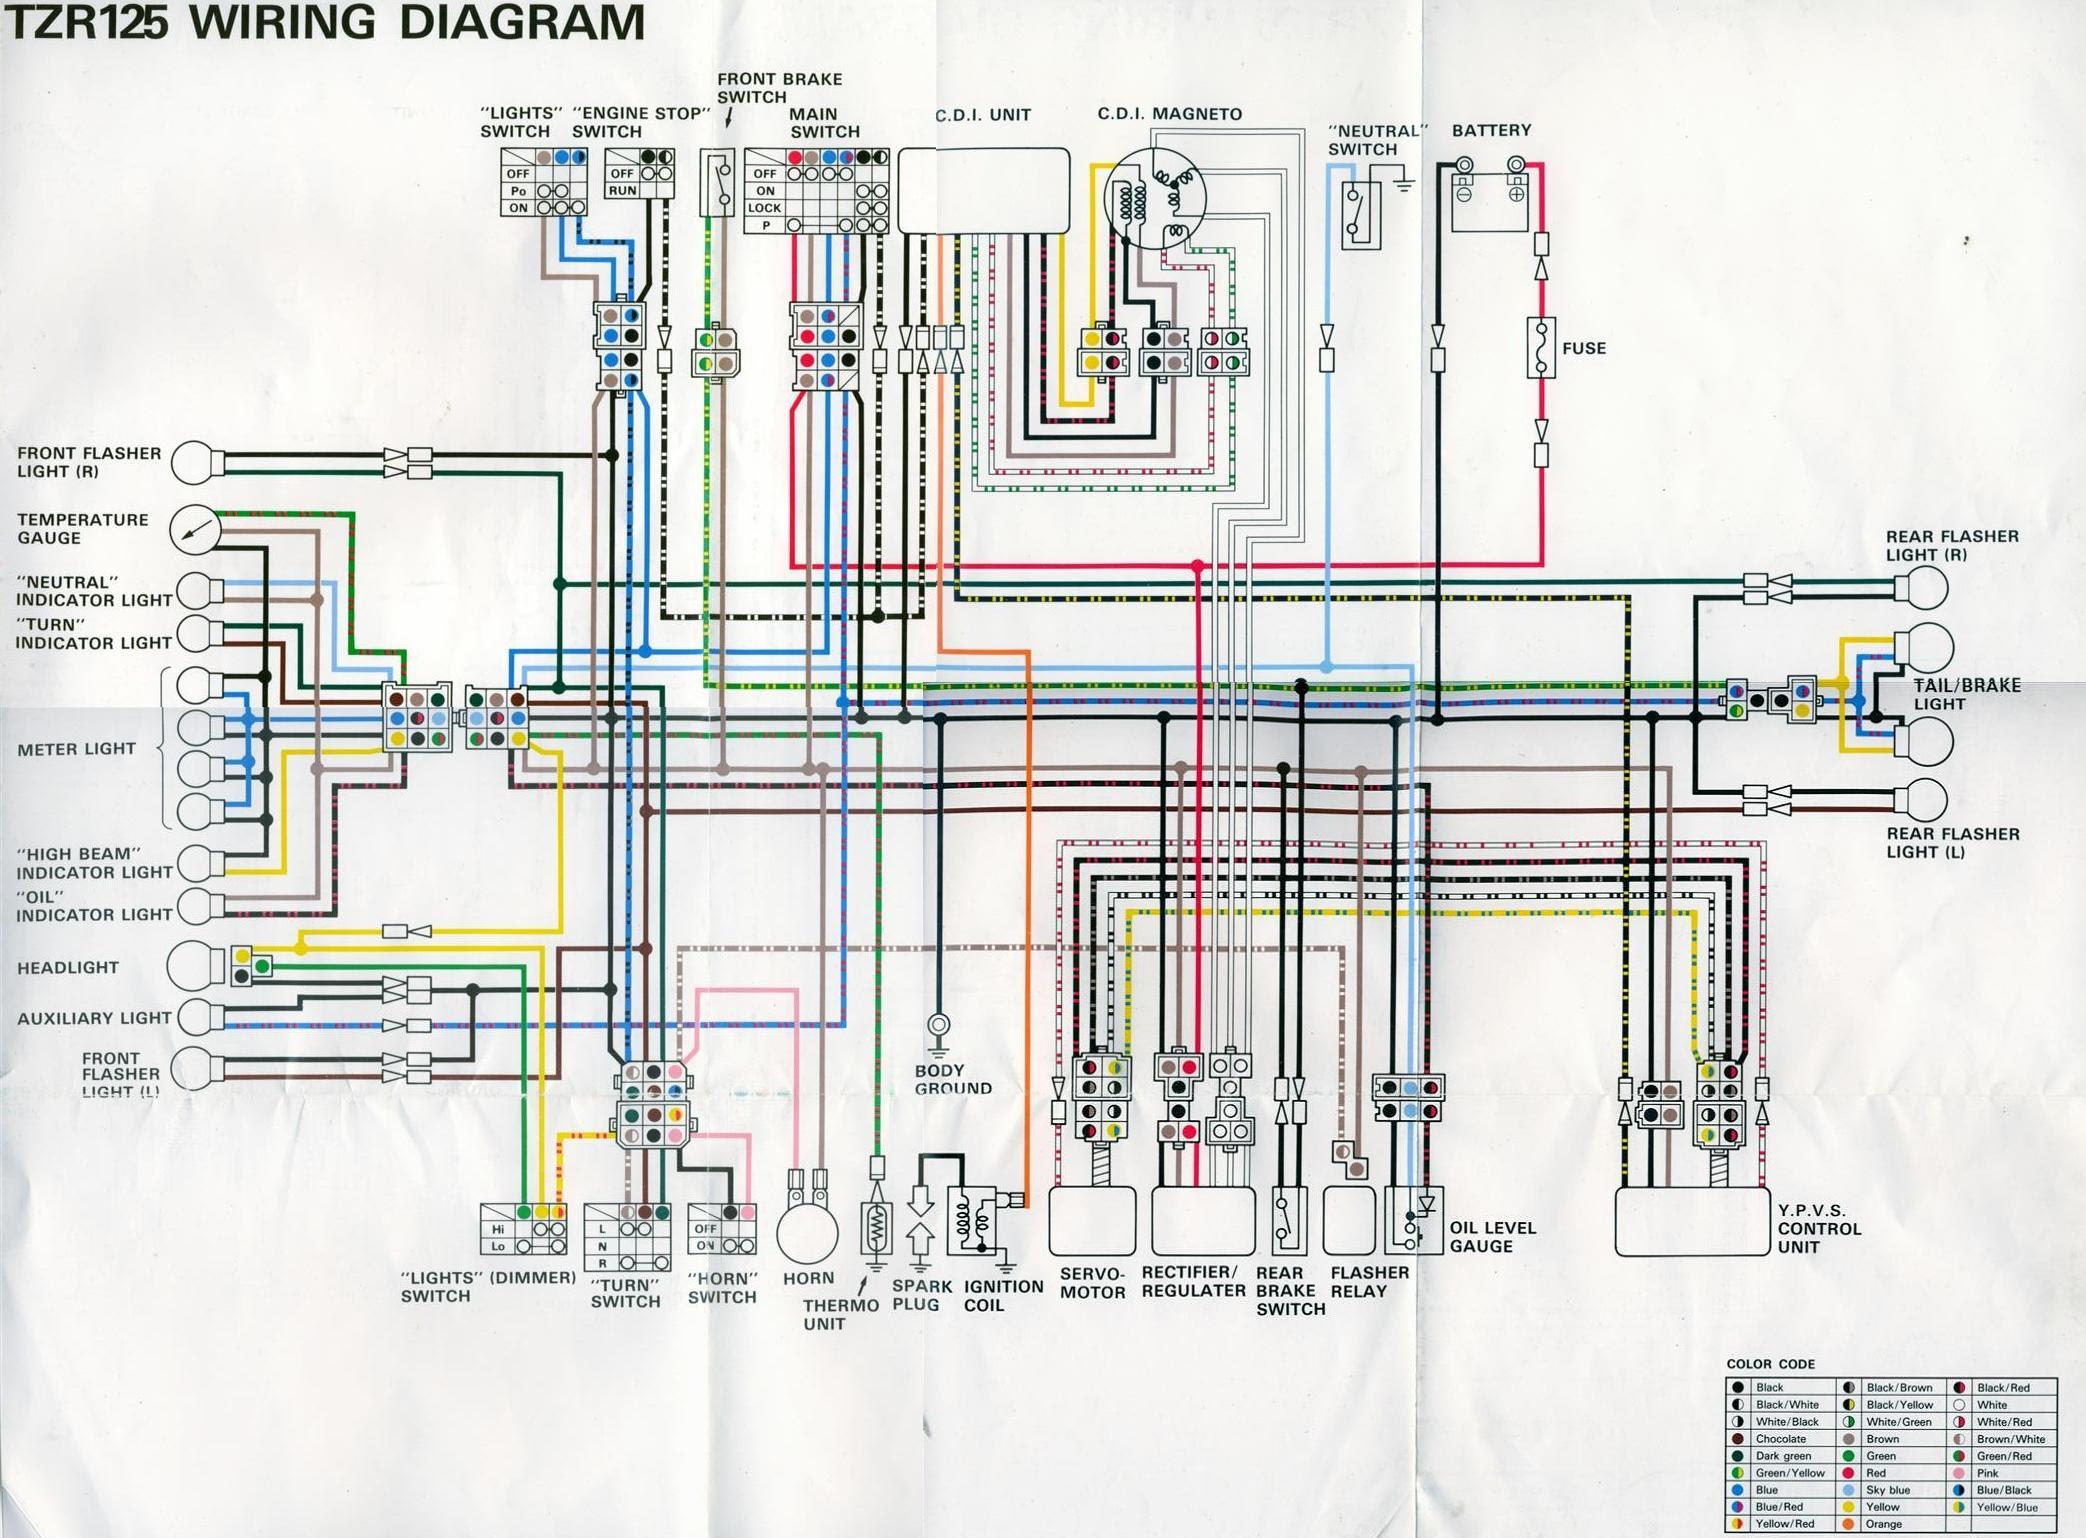 49cc Mini Harley Wiring Diagram Wire Diagram Lift Gate Pumps Begeboy Wiring Diagram Source